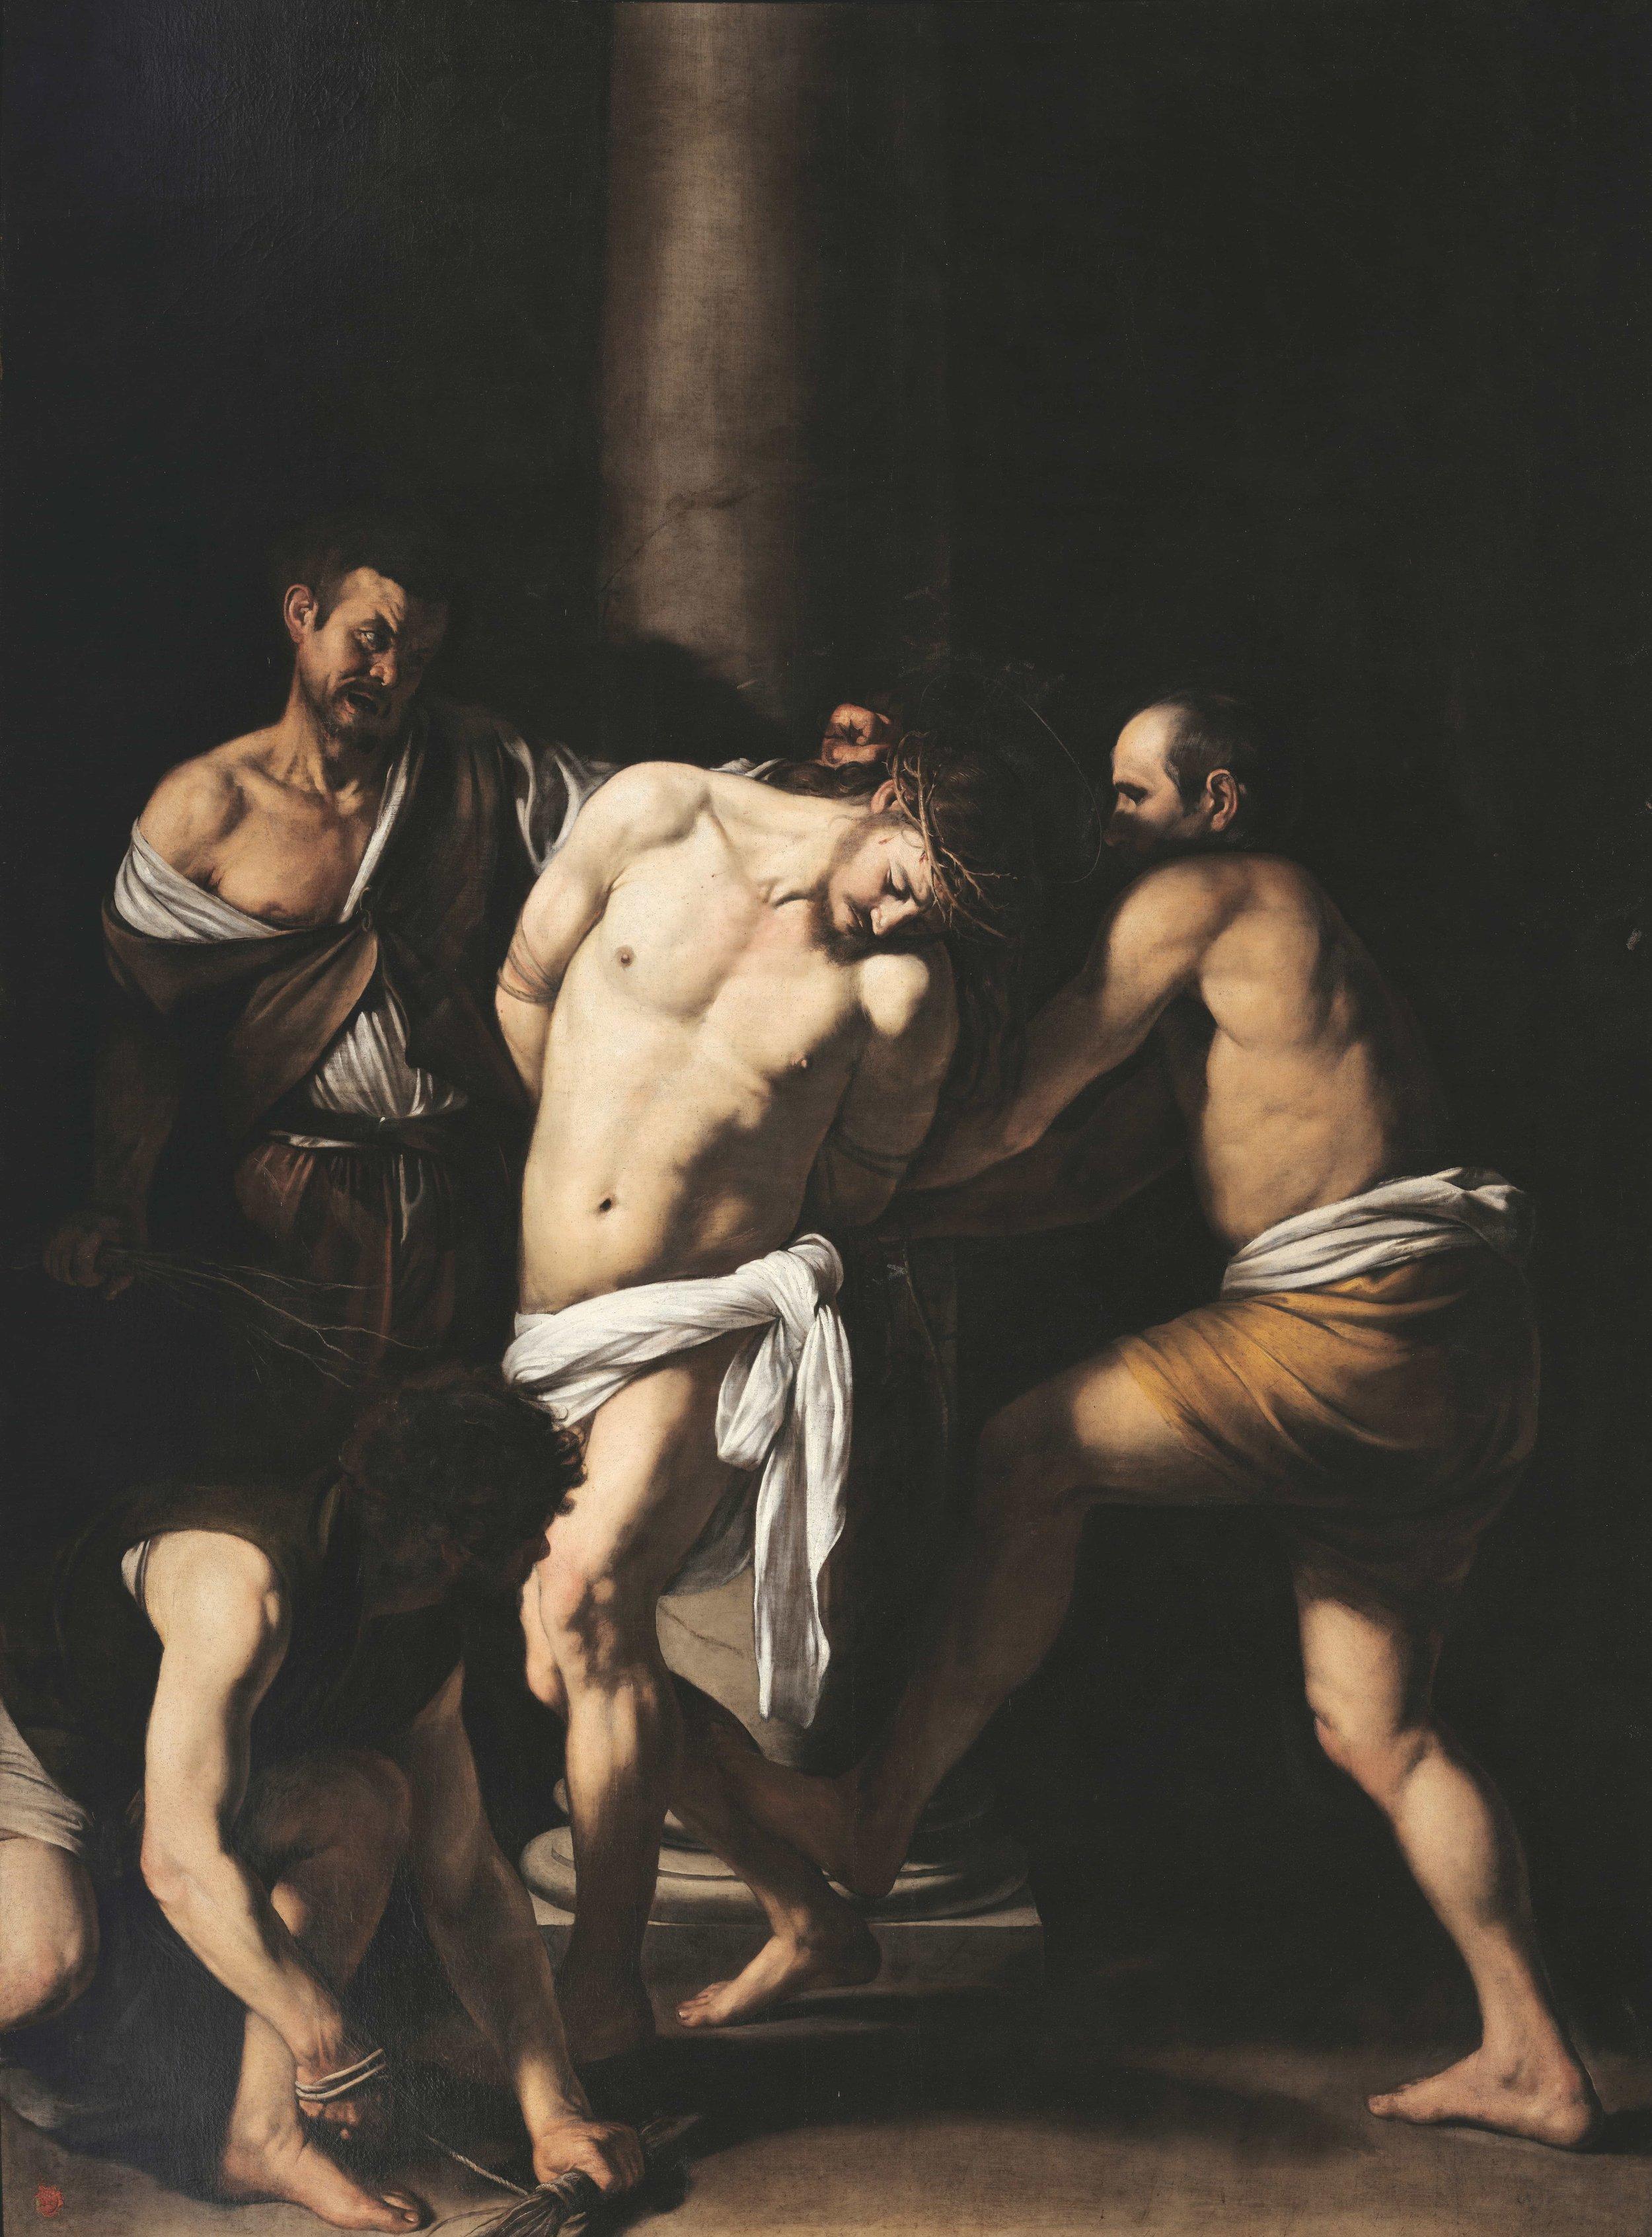 Caravaggio, The Flagellation (1607)